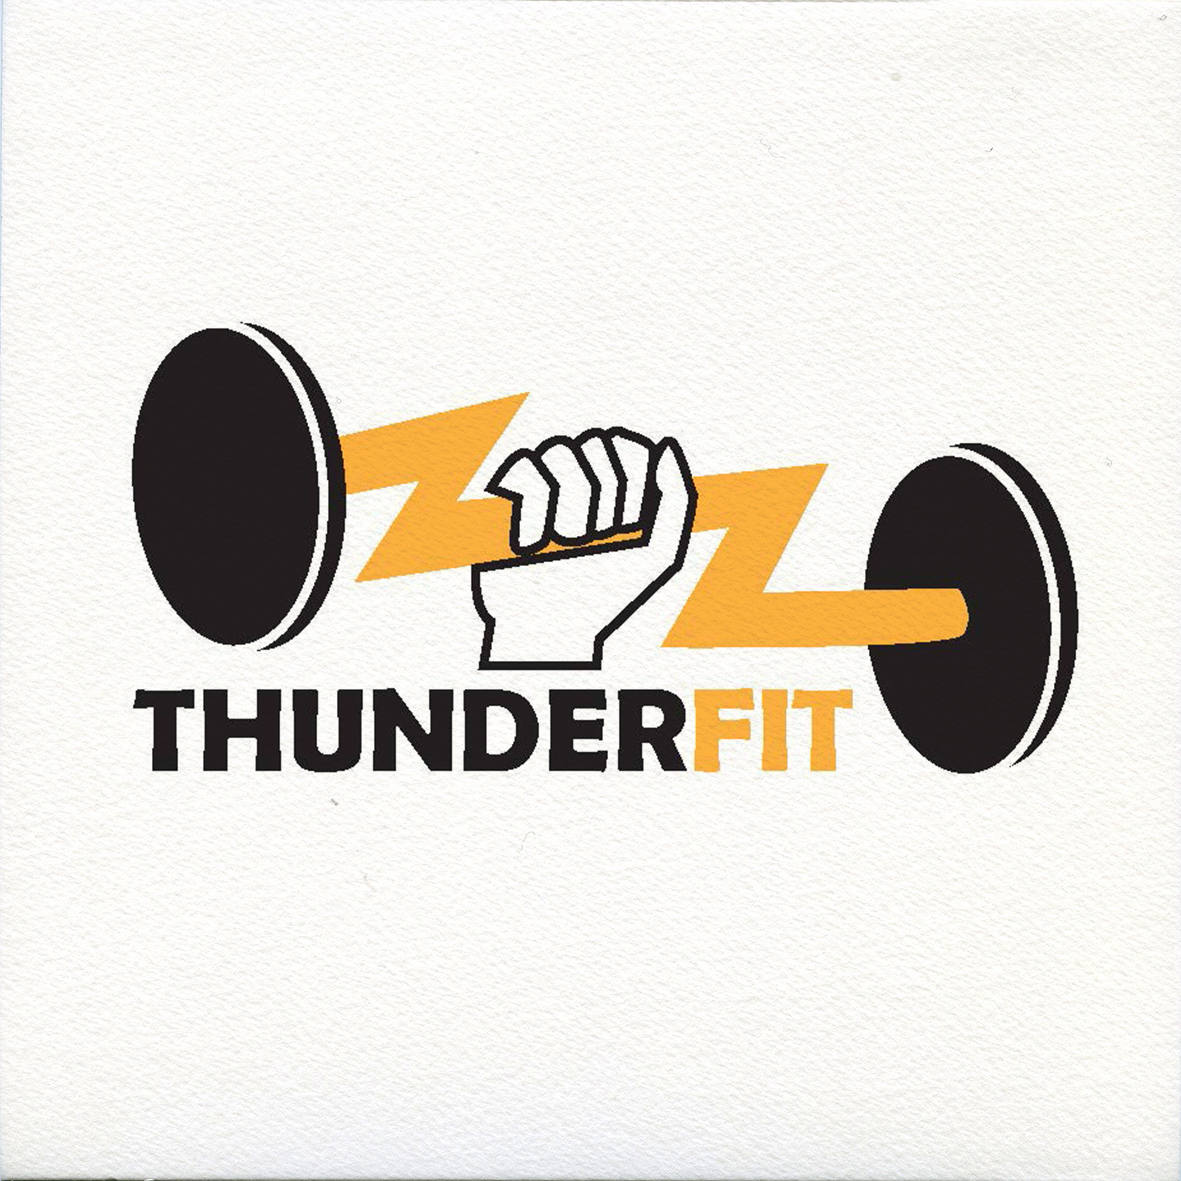 thunderfit logo